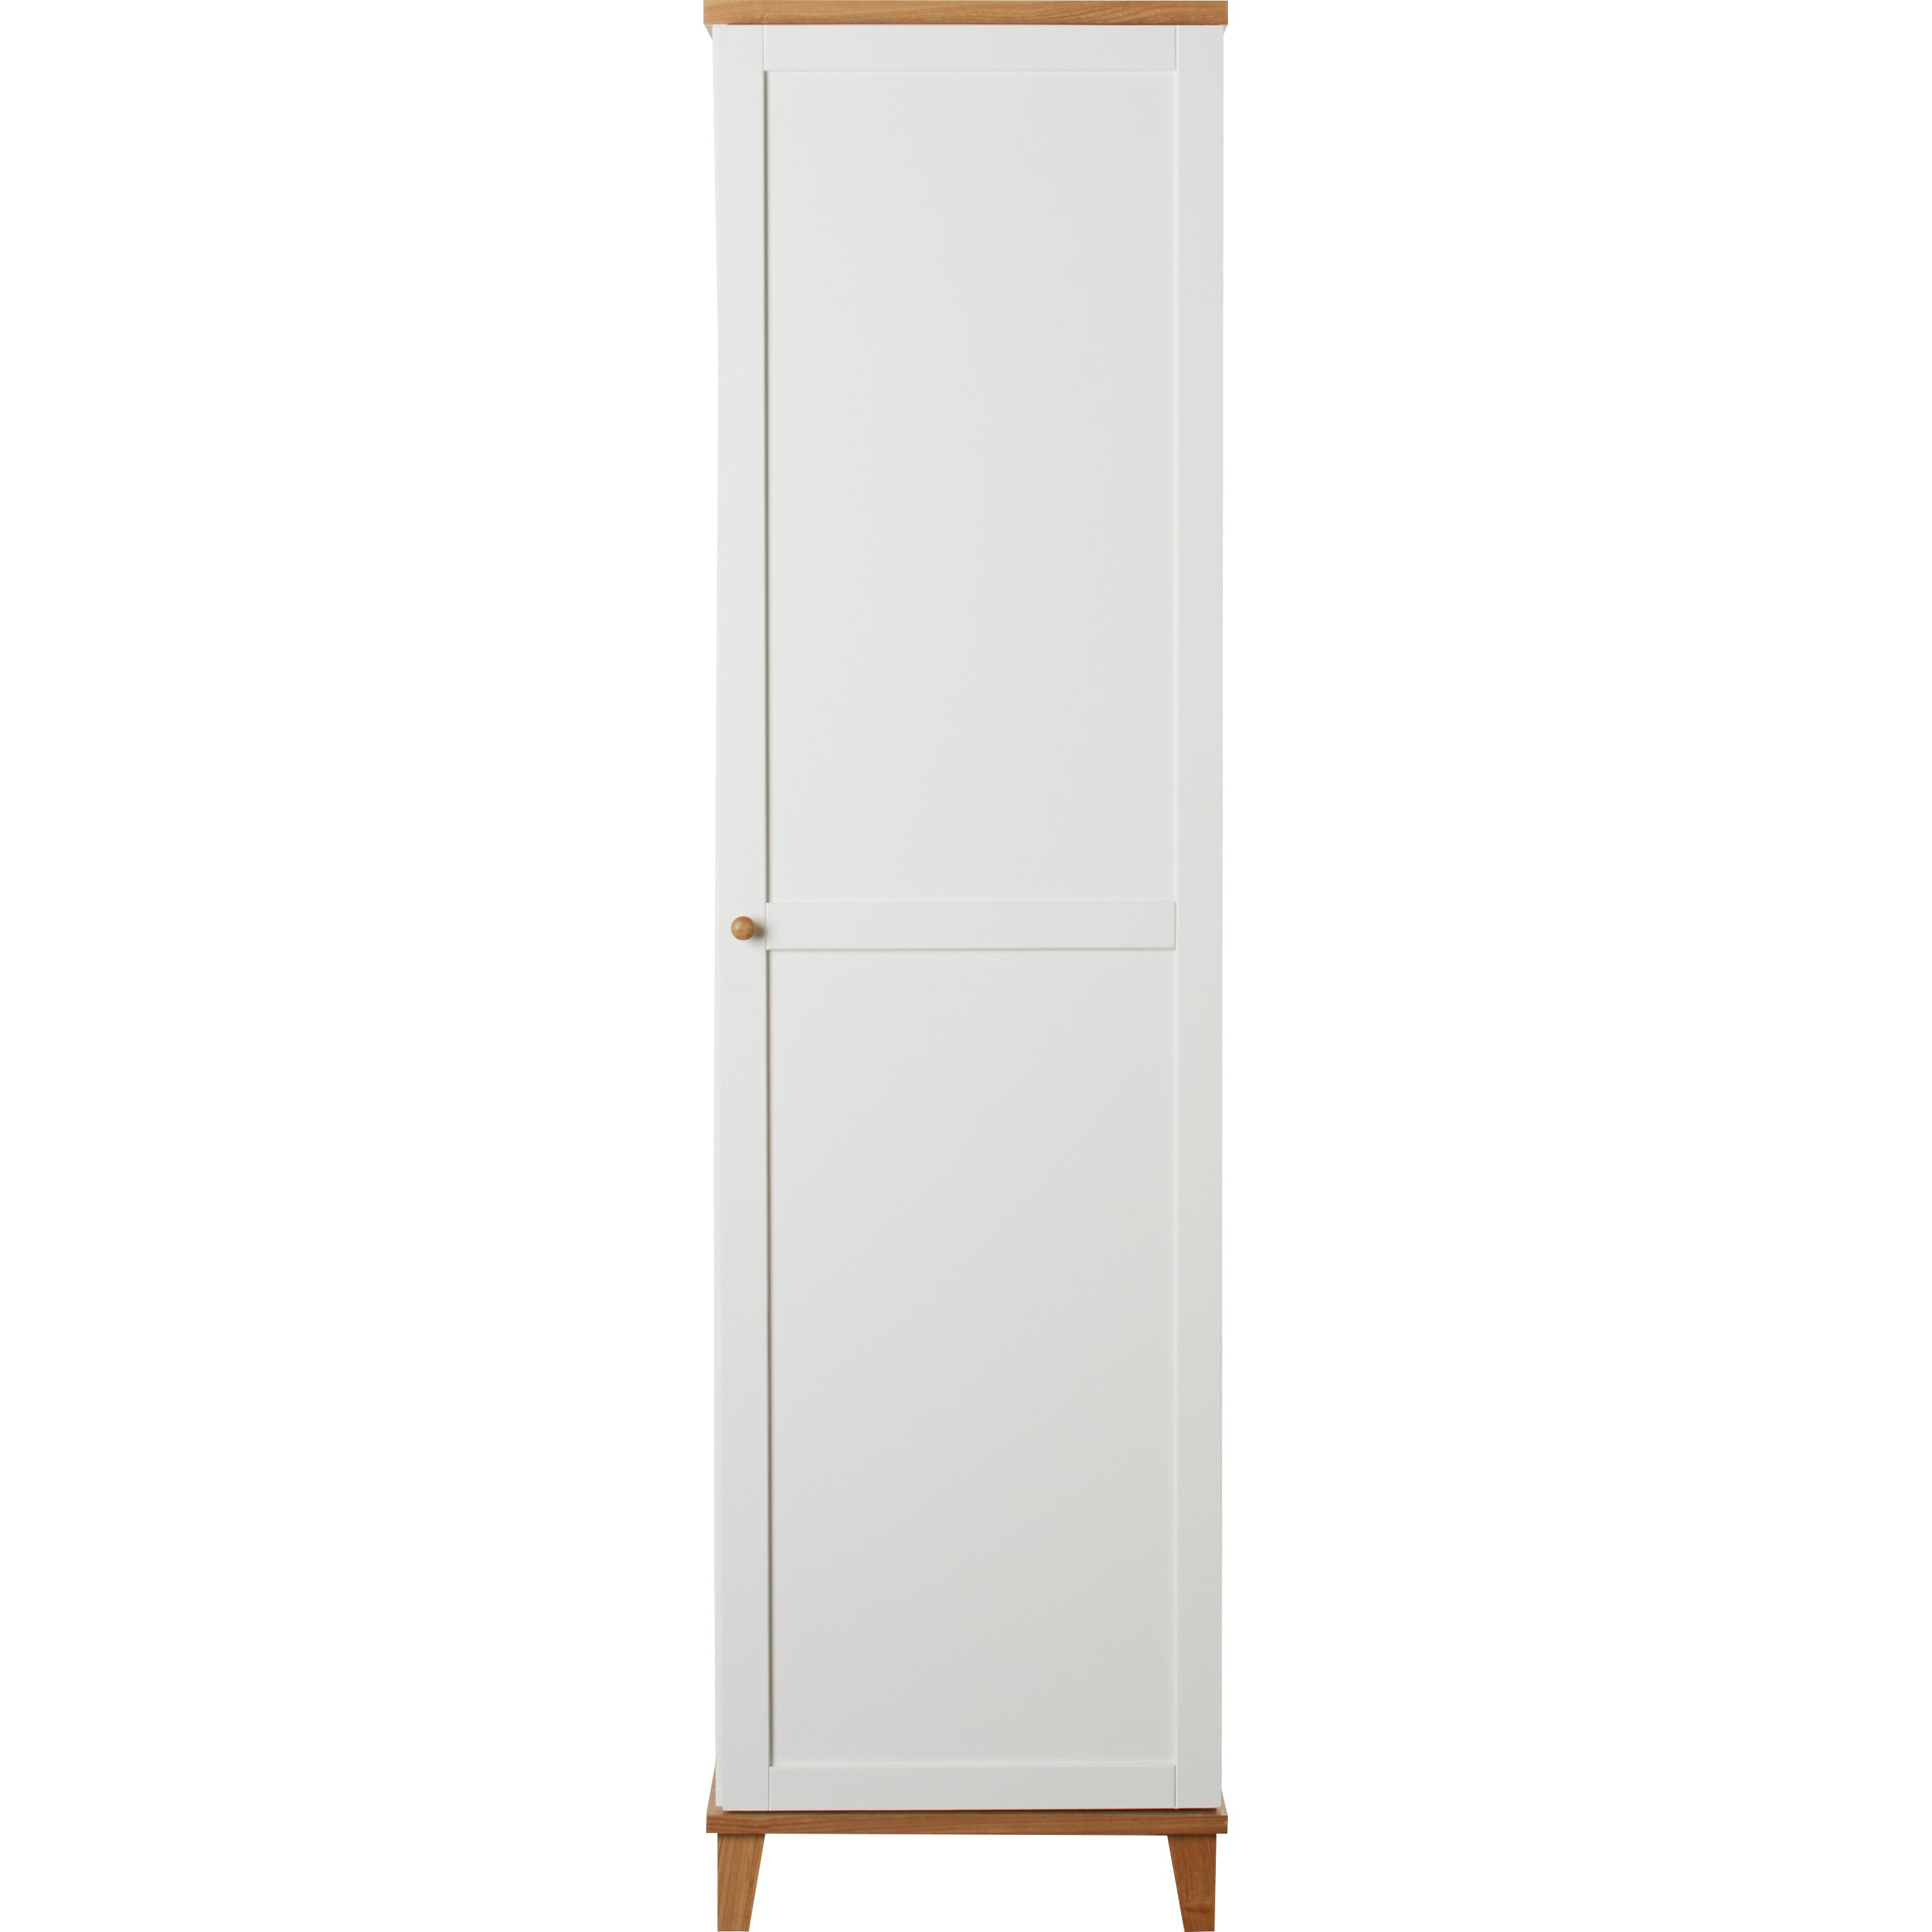 Spring Savings On Voelkel Spot Collection Pine 3 Door Wardrobe